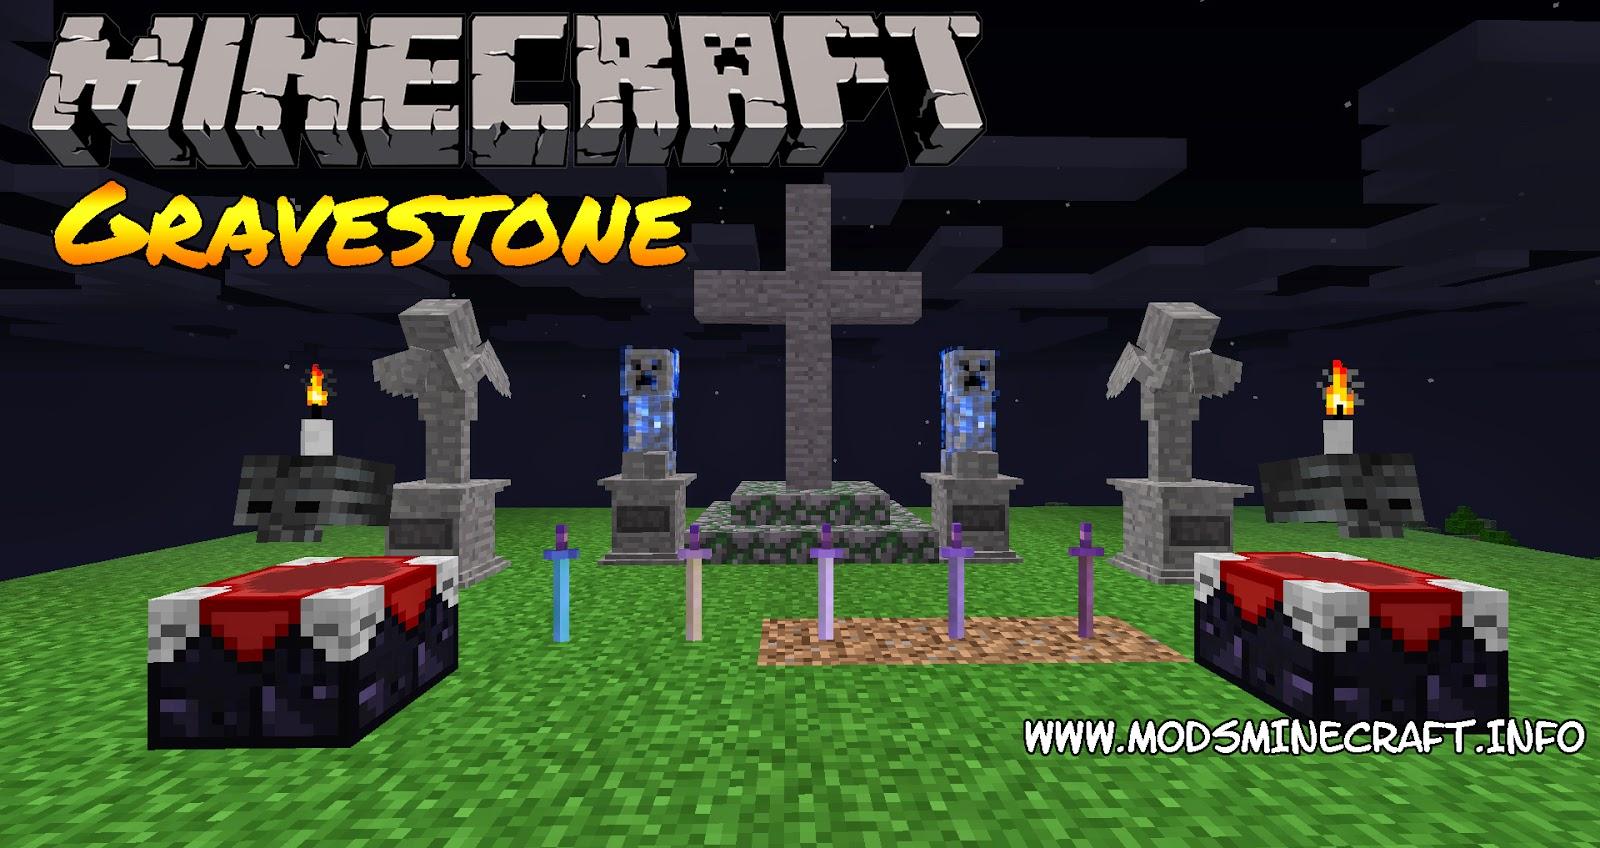 Gravestone Mod para Minecraft 1.7.10, Gravestone Mod para Minecraft 1.7.2, Gravestone Mod, Gravestone 1.7.2, minecraft Gravestone Mod, minecraft Gravestone 1.7.2, minecraft 1.7.2, mods 1.7.2, minecraft mods 1.7.2, minecraft mods, mods minecraft, descargar mods minecraft, mods para minecraft 1.7.2, cómo instalar mods, cómo instalar mods minecraft, minecraft cómo instalar mods